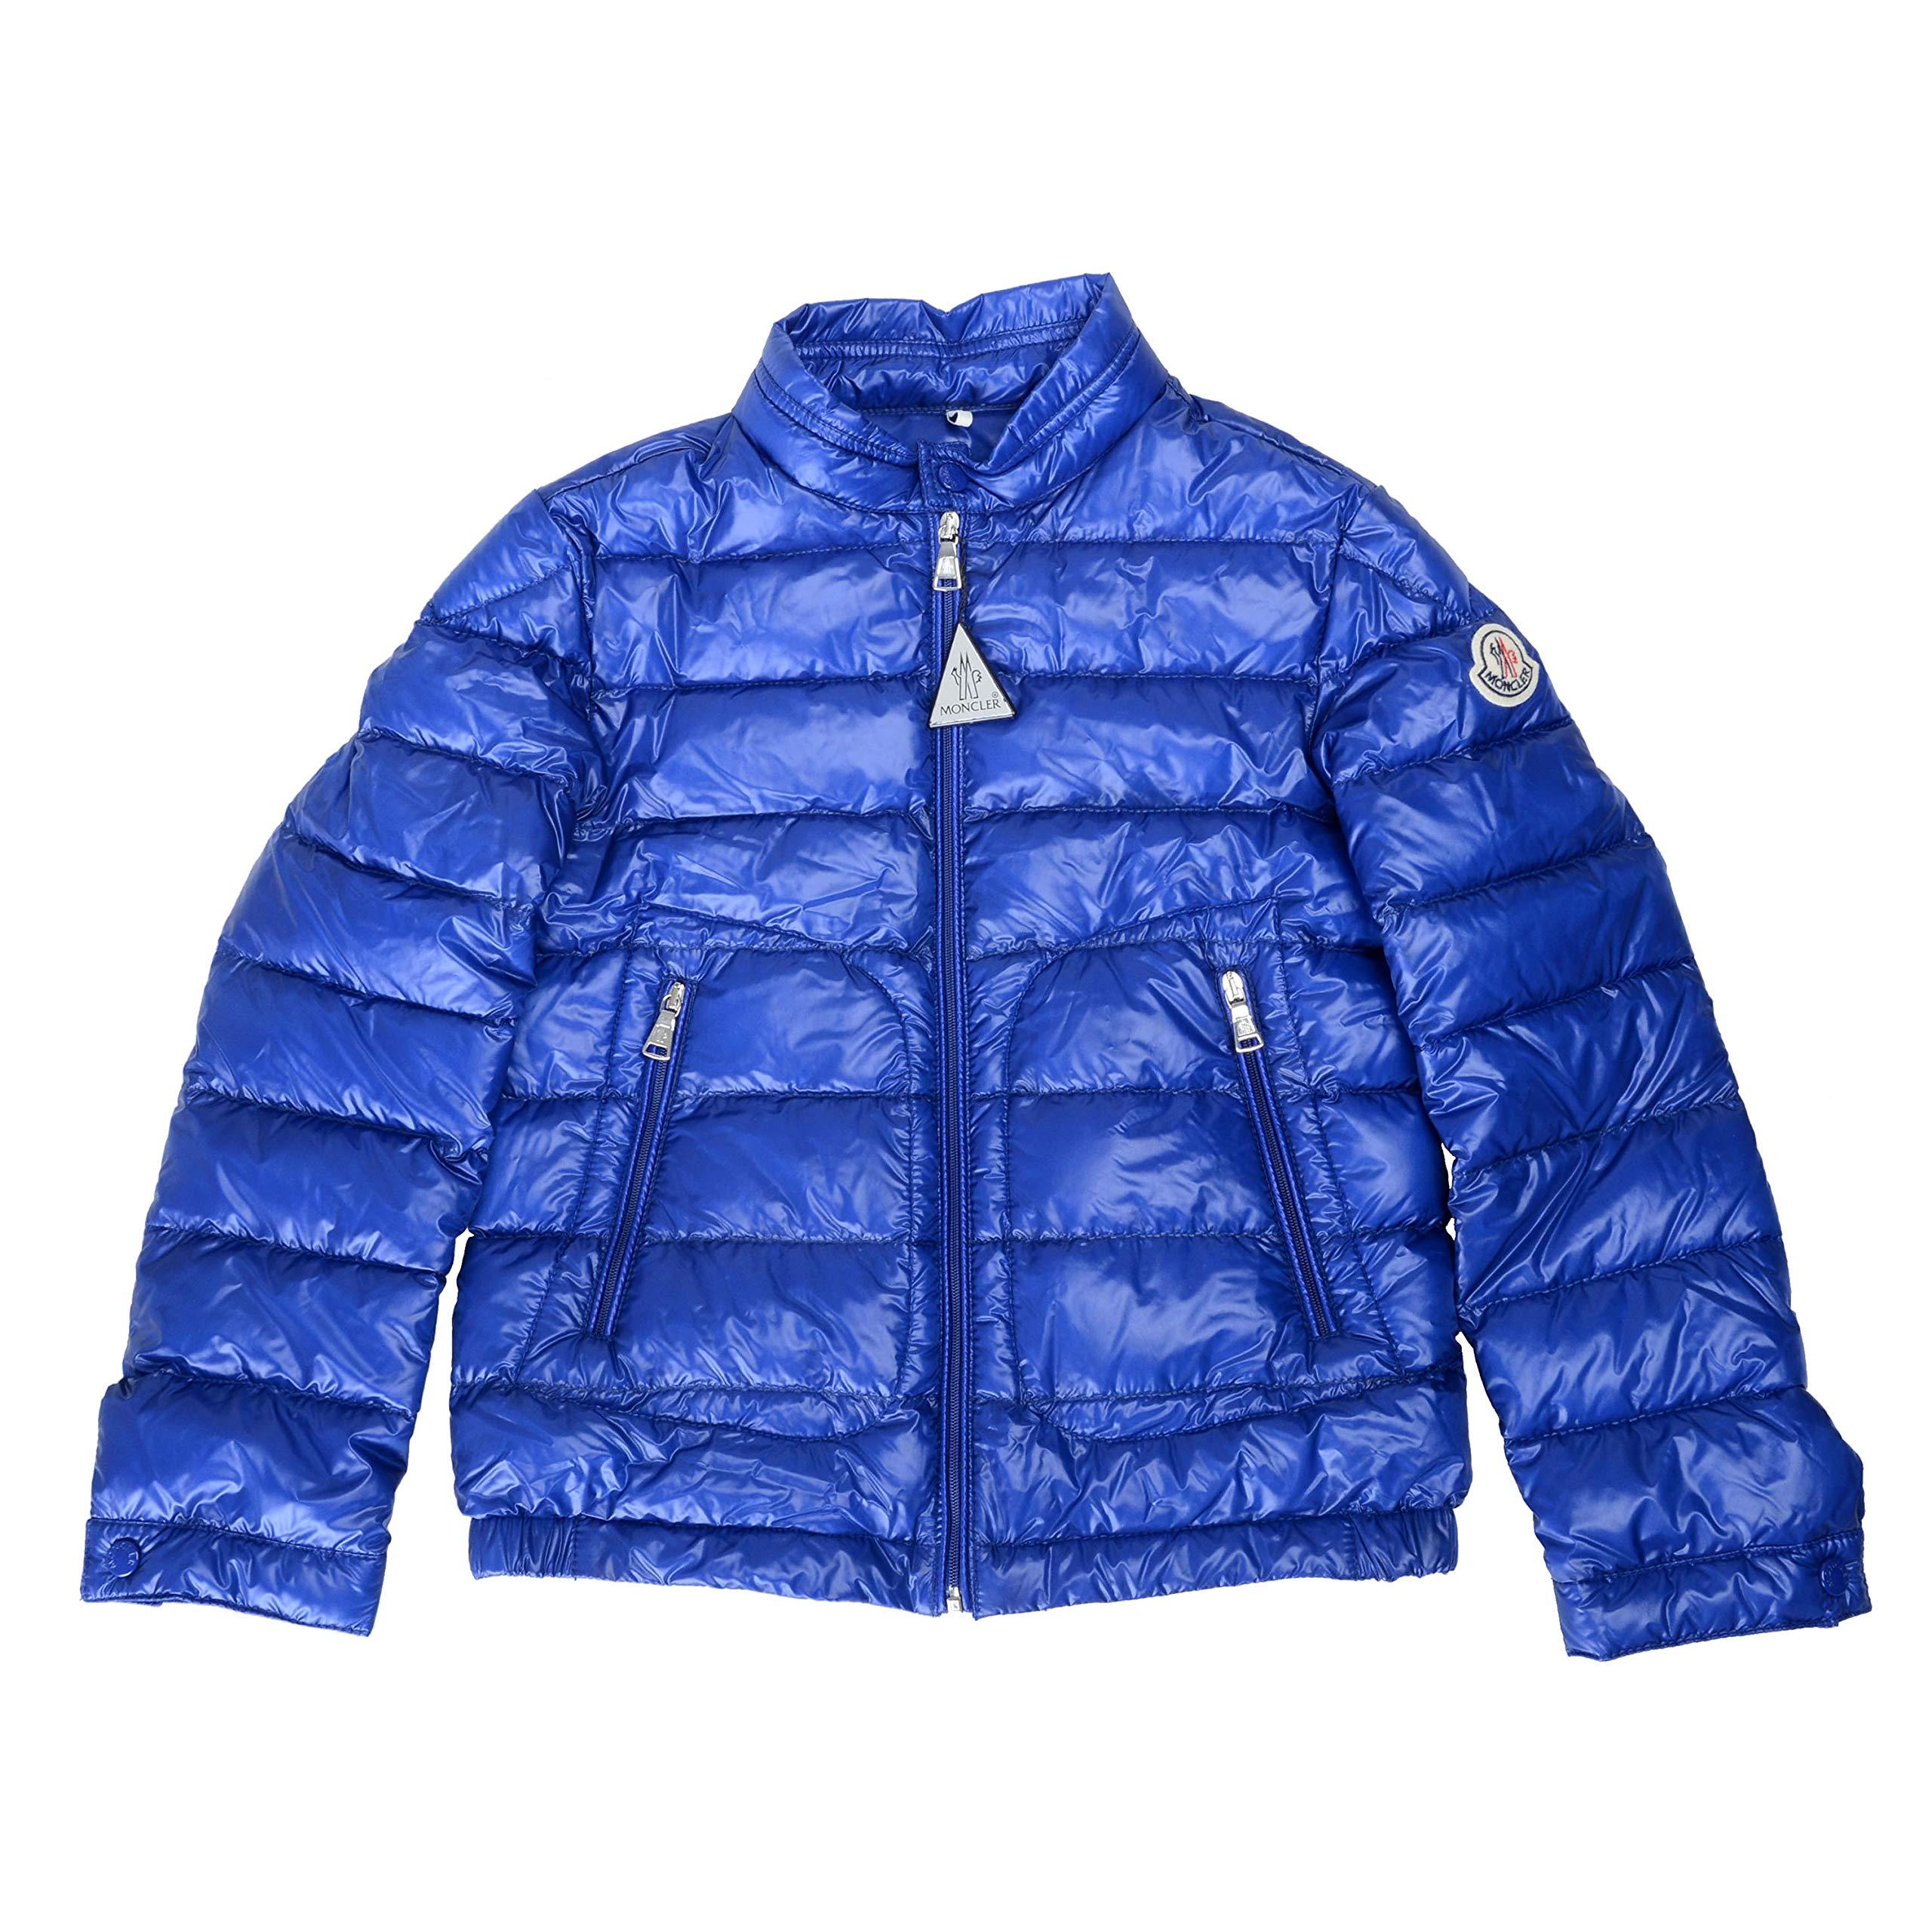 Moncler Kid's ACORUS Blue Down Parka Jacket Moncler Size 8A US 8Years